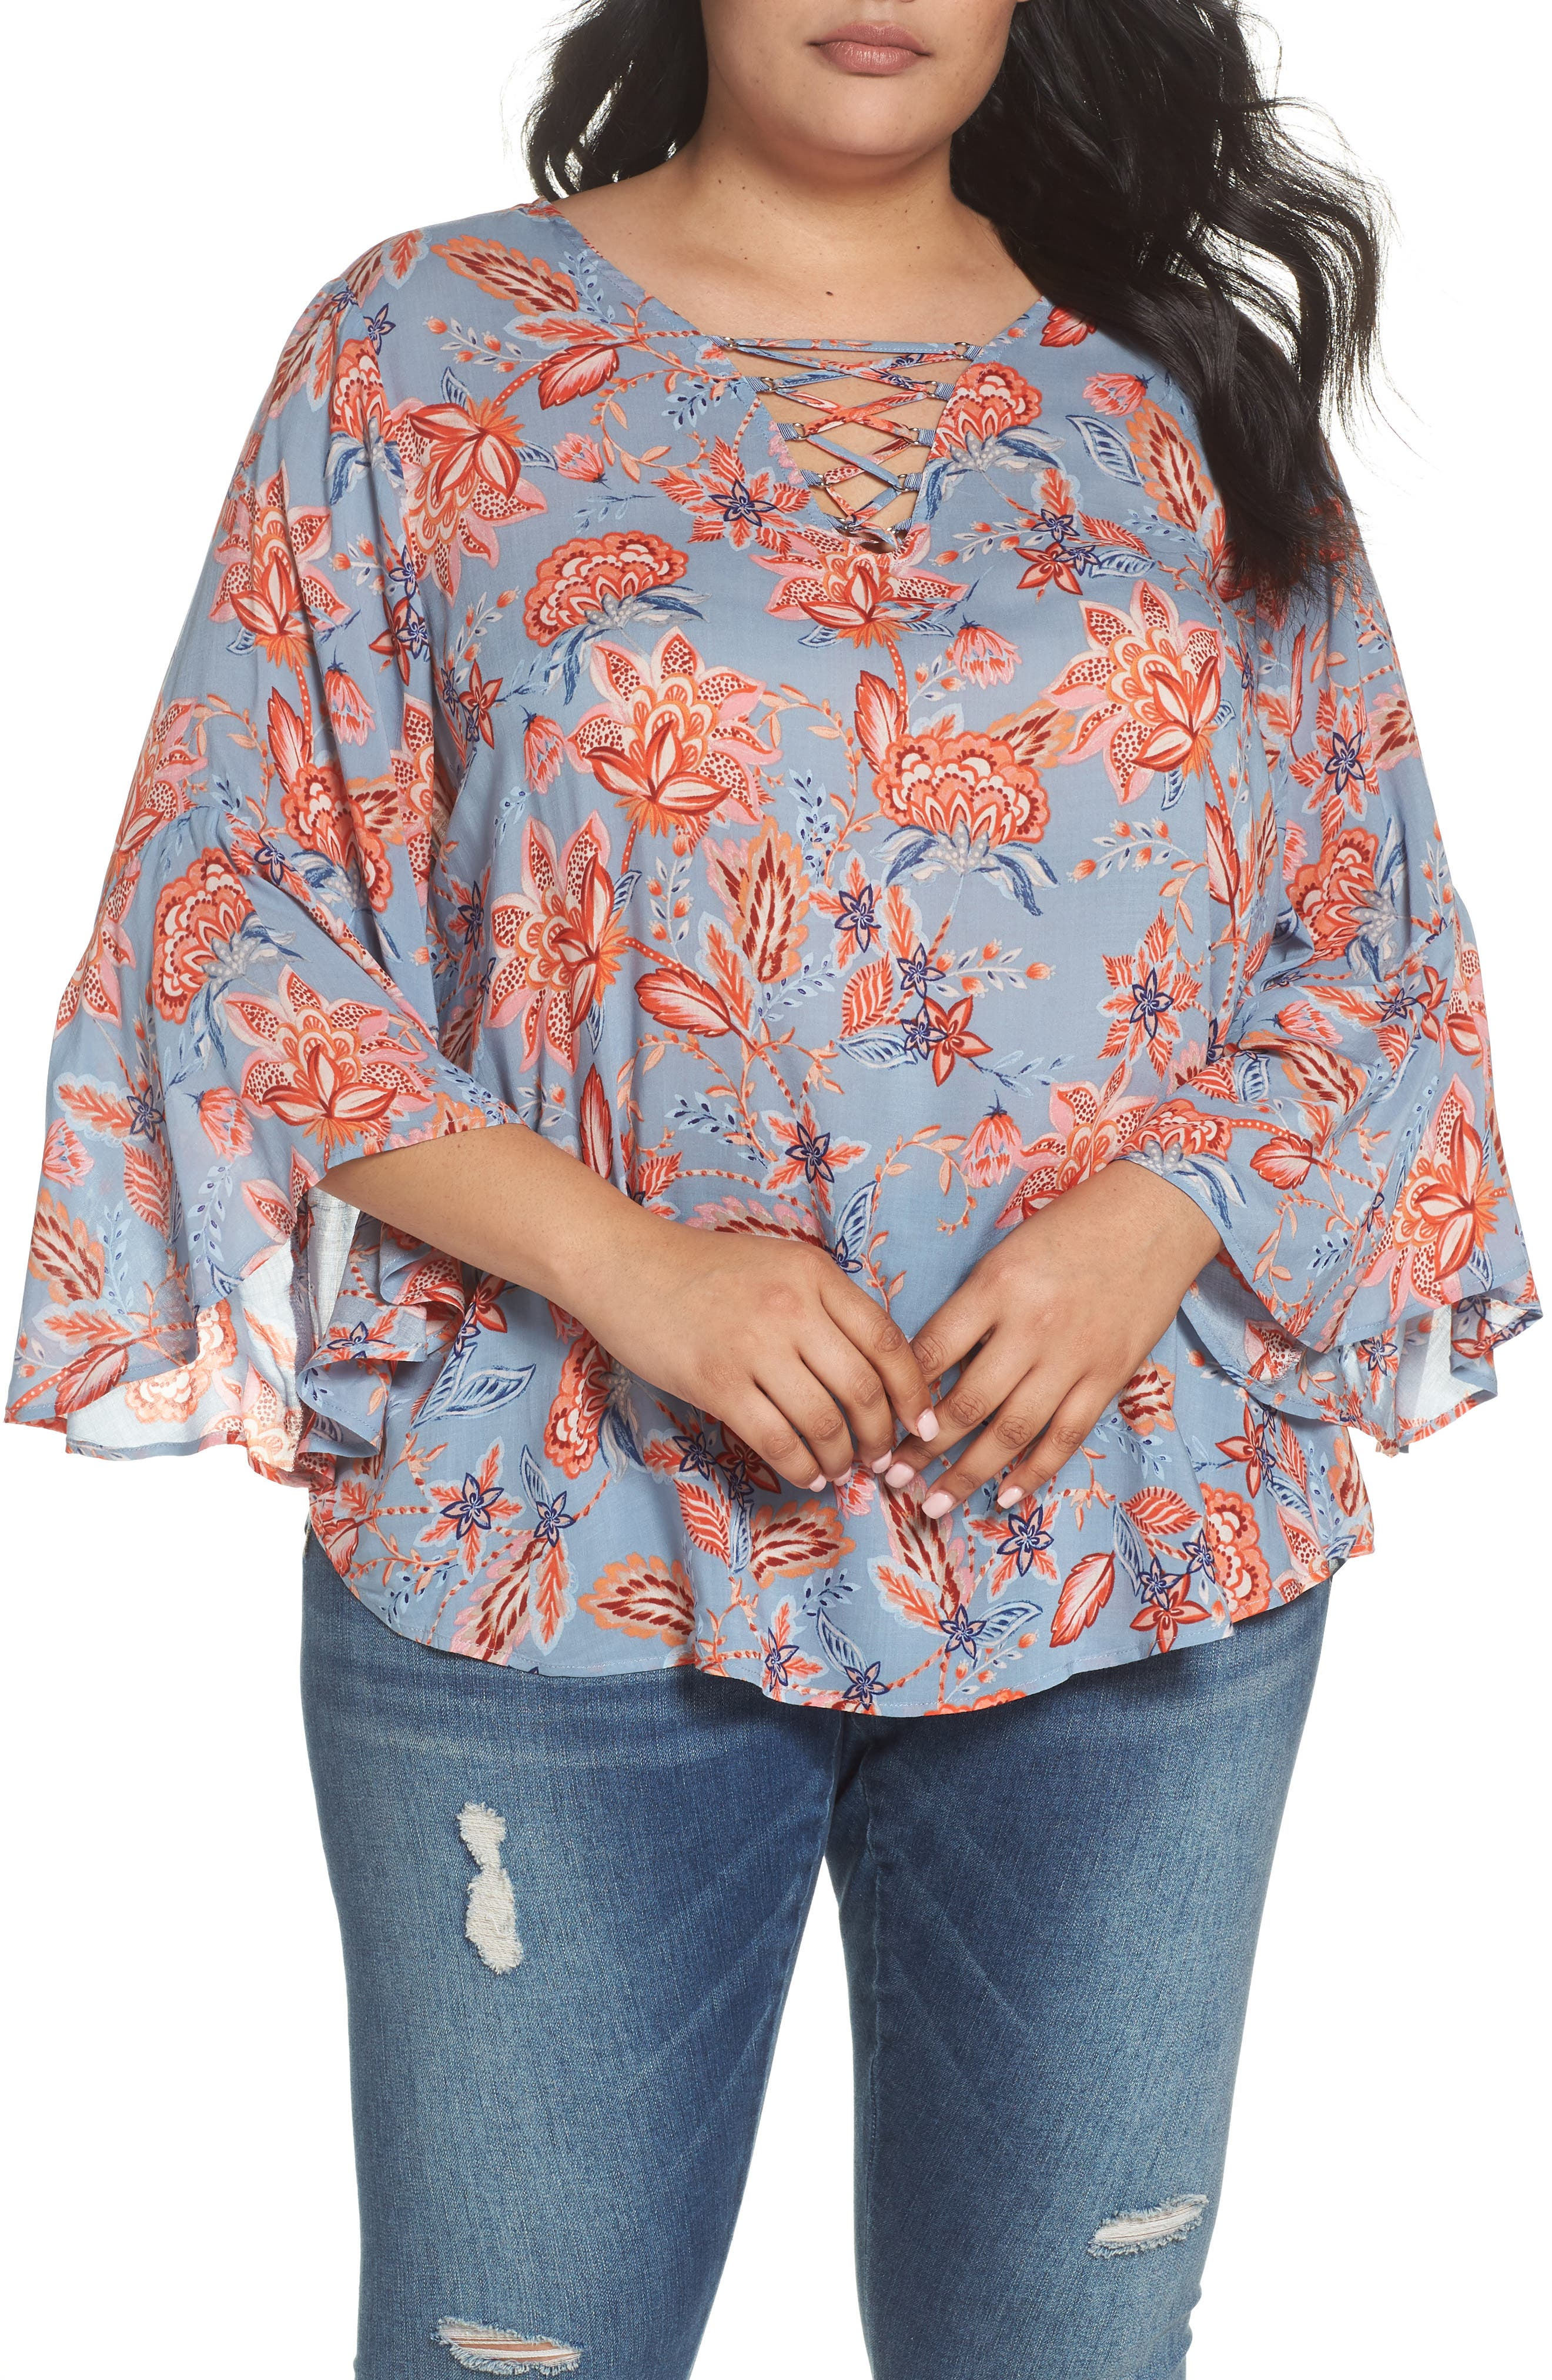 Wit & Wisdom Lace Up Floral Top (Plus Size) (Nordstrom Exclusive)